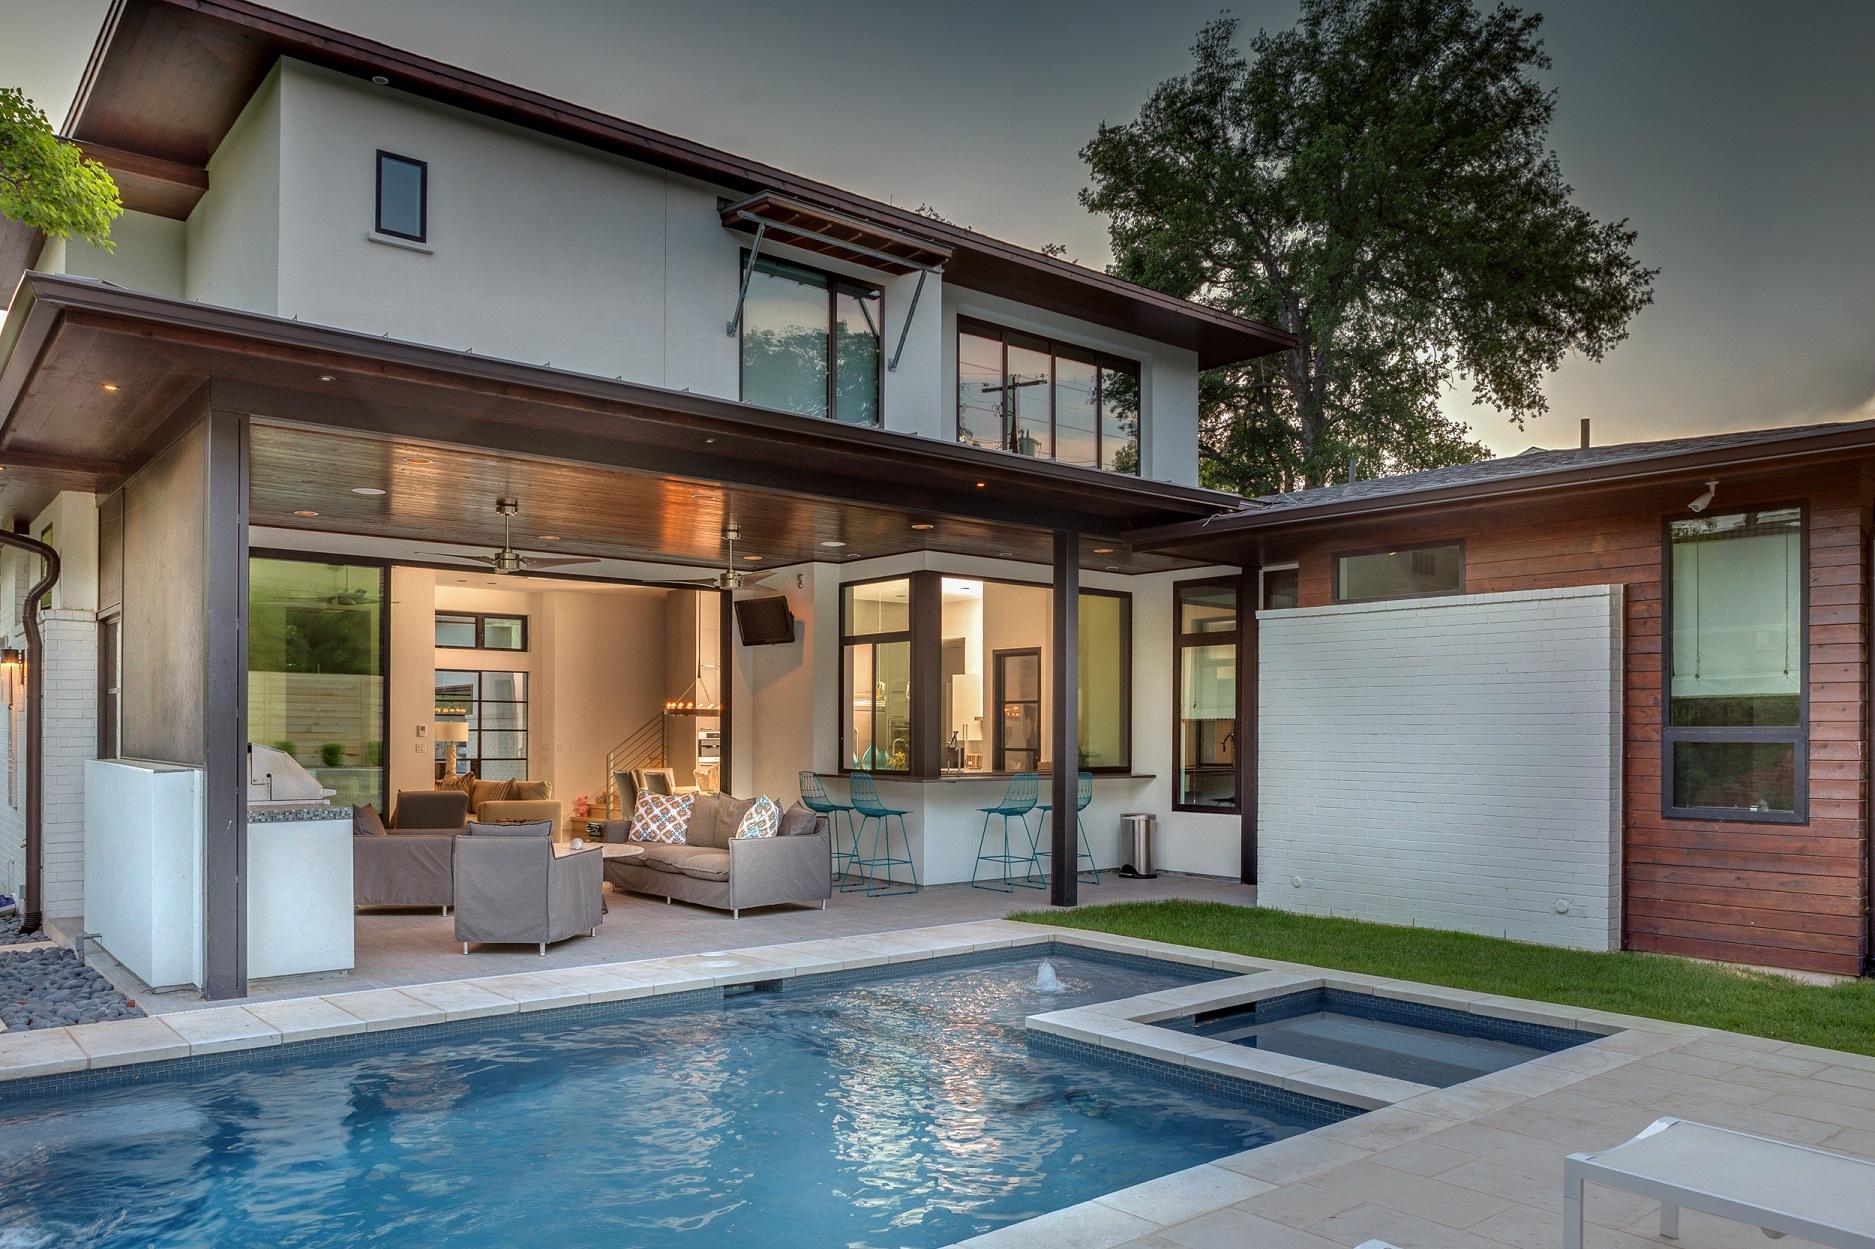 ethridge-pool